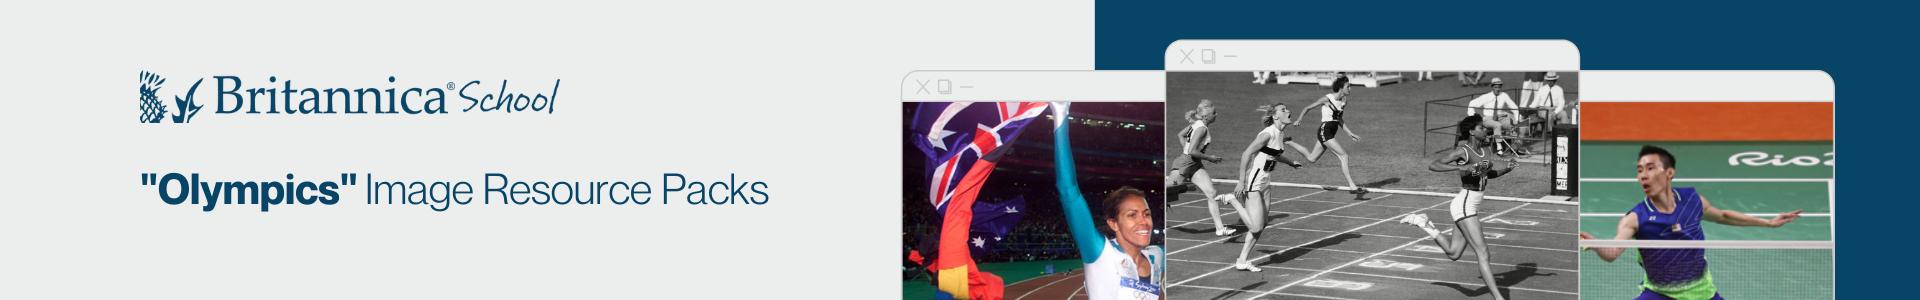 capture-olympics-resource-packs-banner